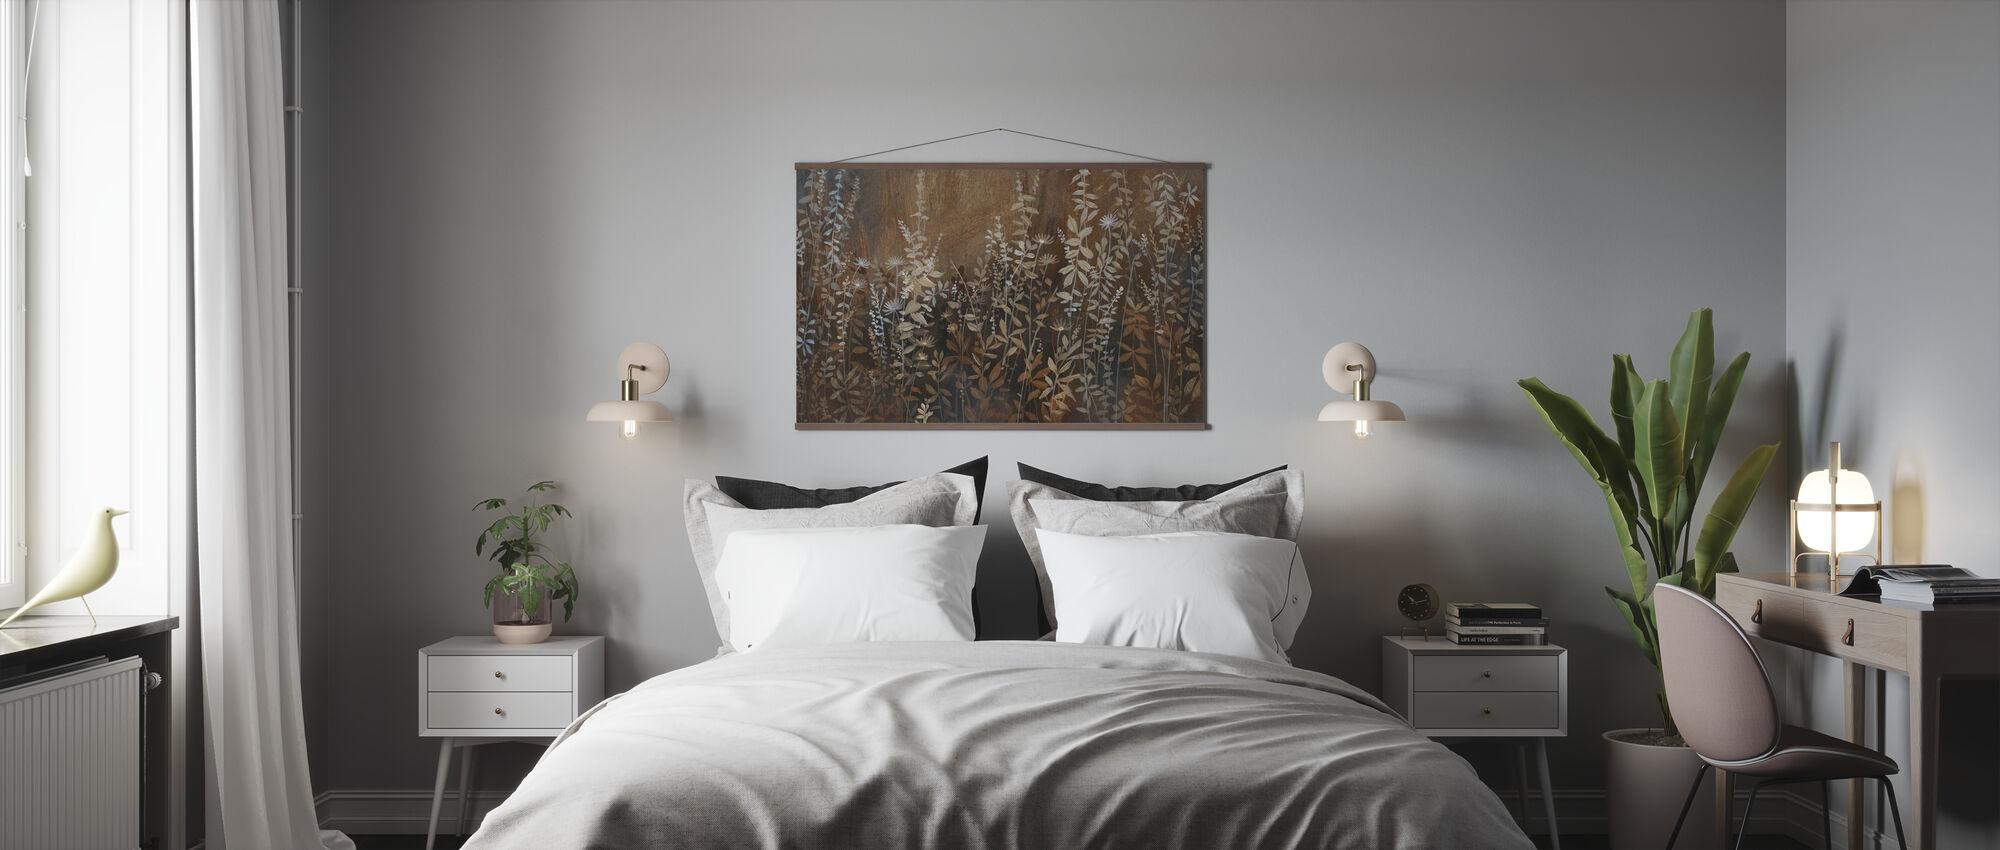 End of Season - Poster - Bedroom